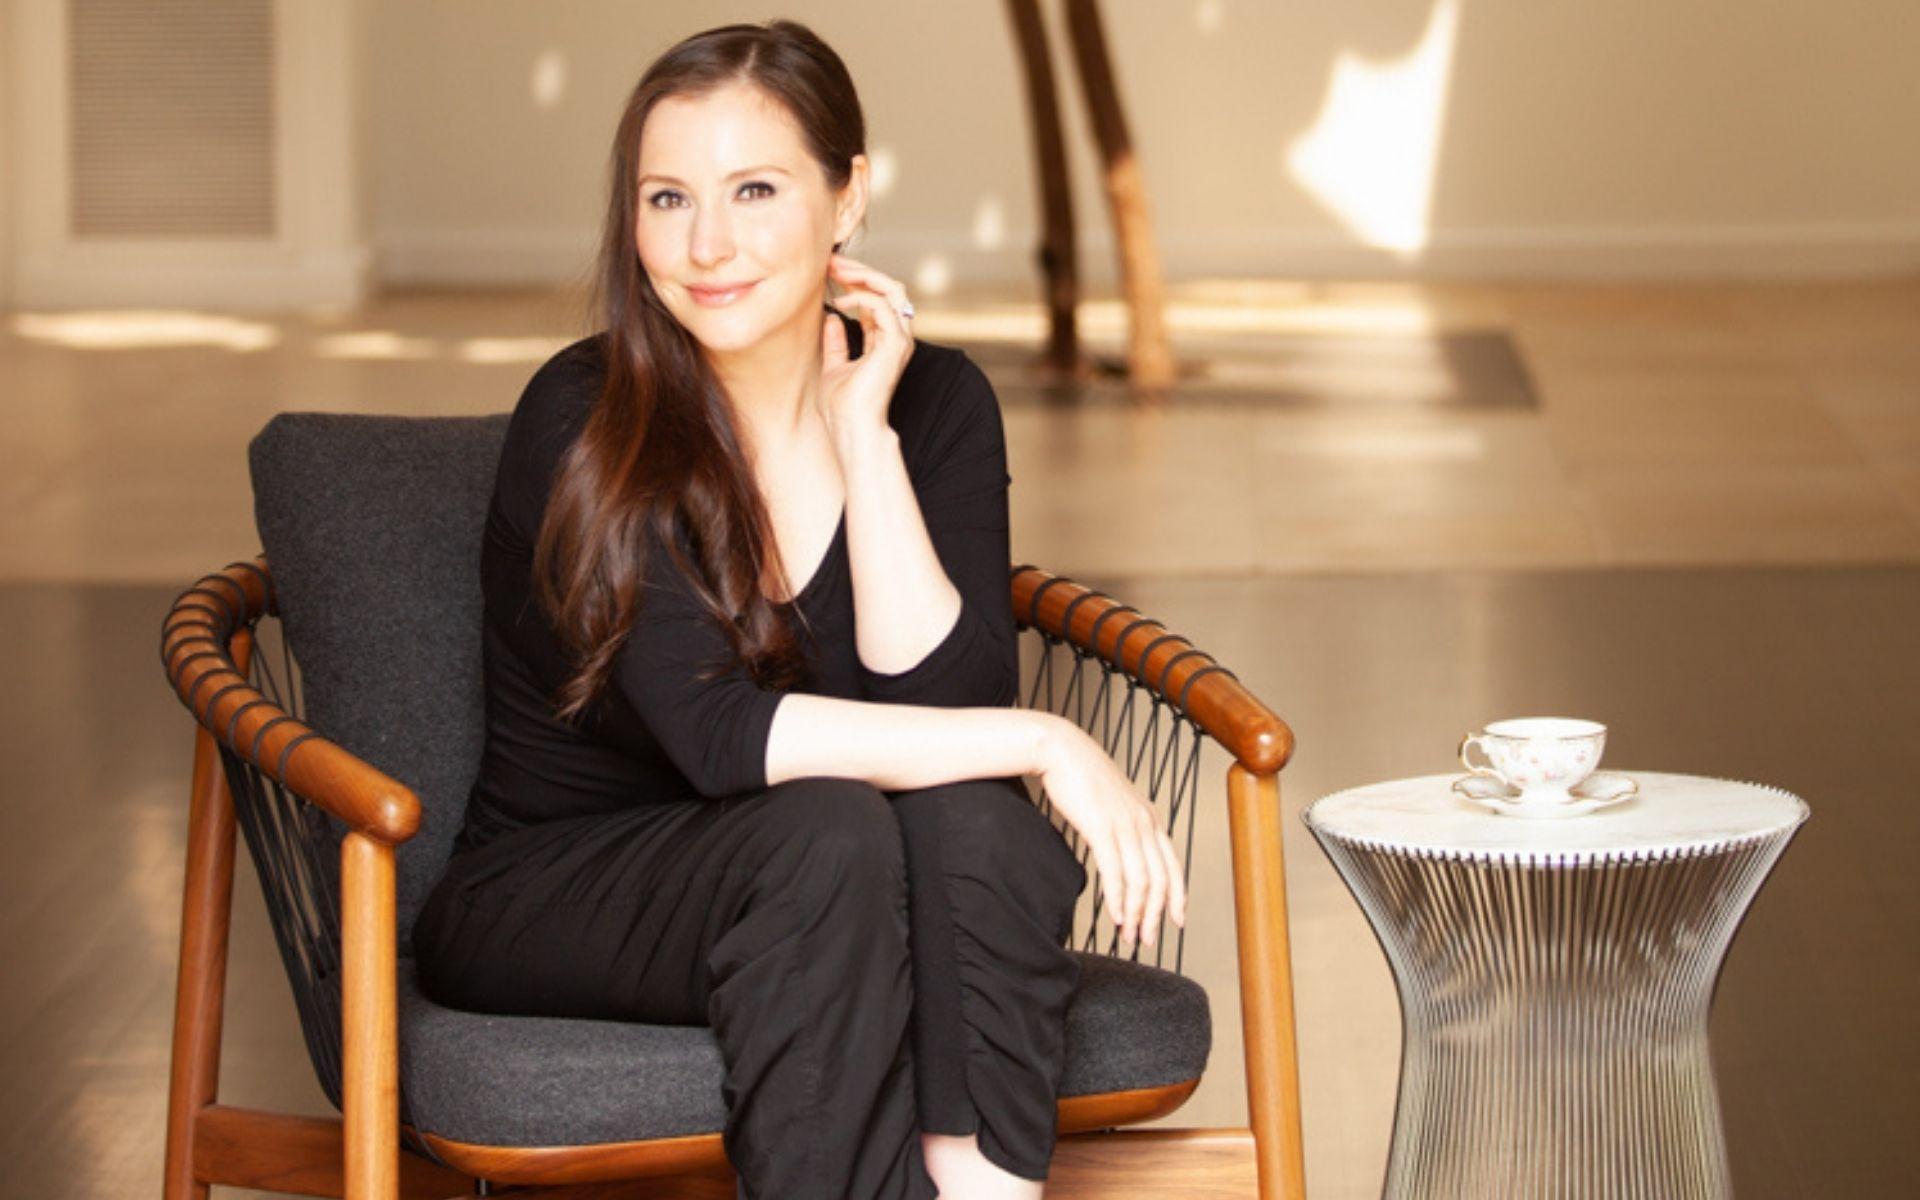 Beauty Entrepreneur Sunday Riley Shares Her Skincare Tips